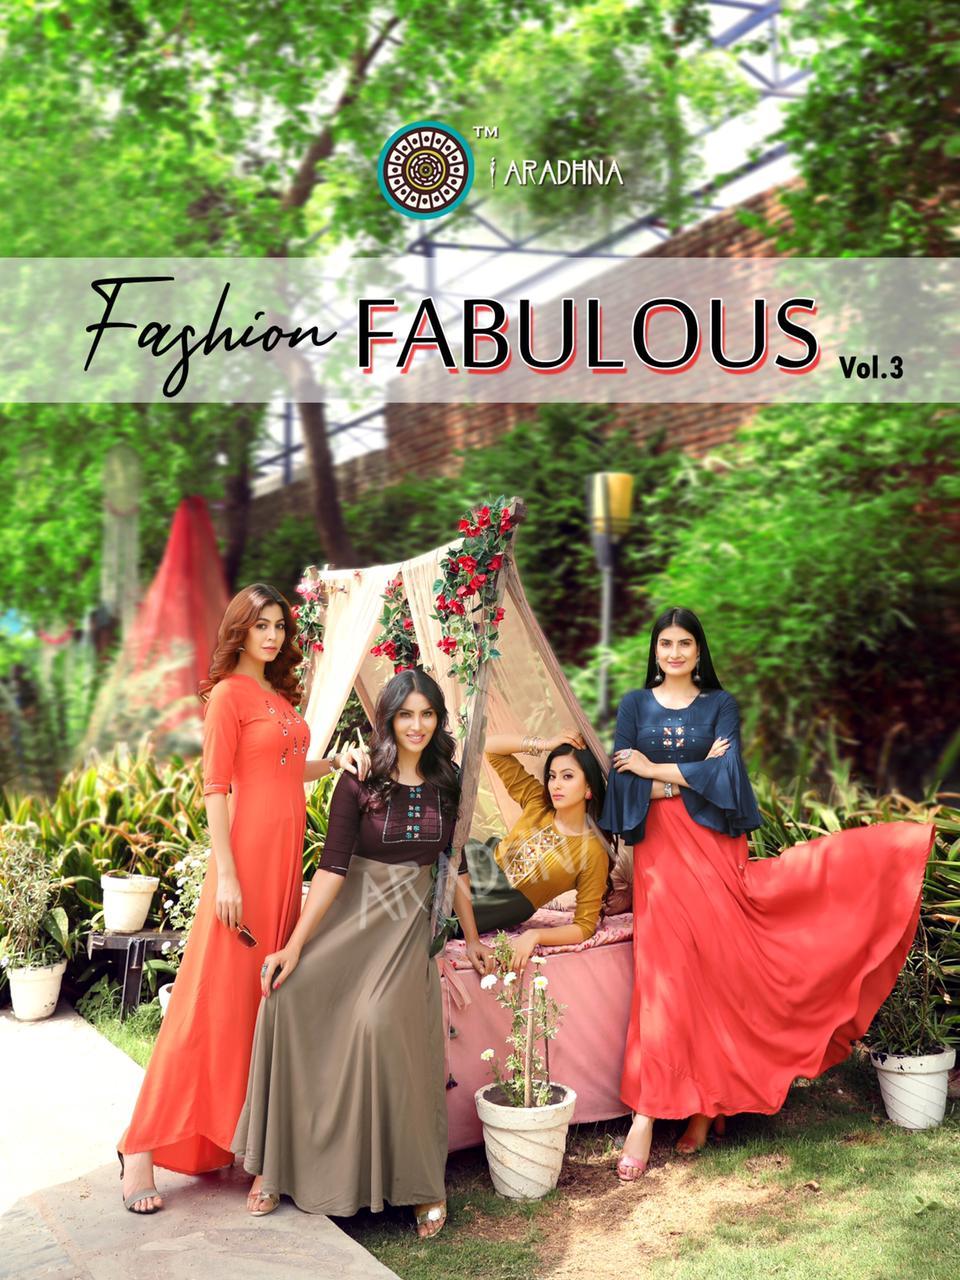 Aradhna Fashion Fabulous Vol 3 Kurti Wholesale Catalog 12 Pcs 5 - Aradhna Fashion Fabulous Vol 3 Kurti Wholesale Catalog 12 Pcs